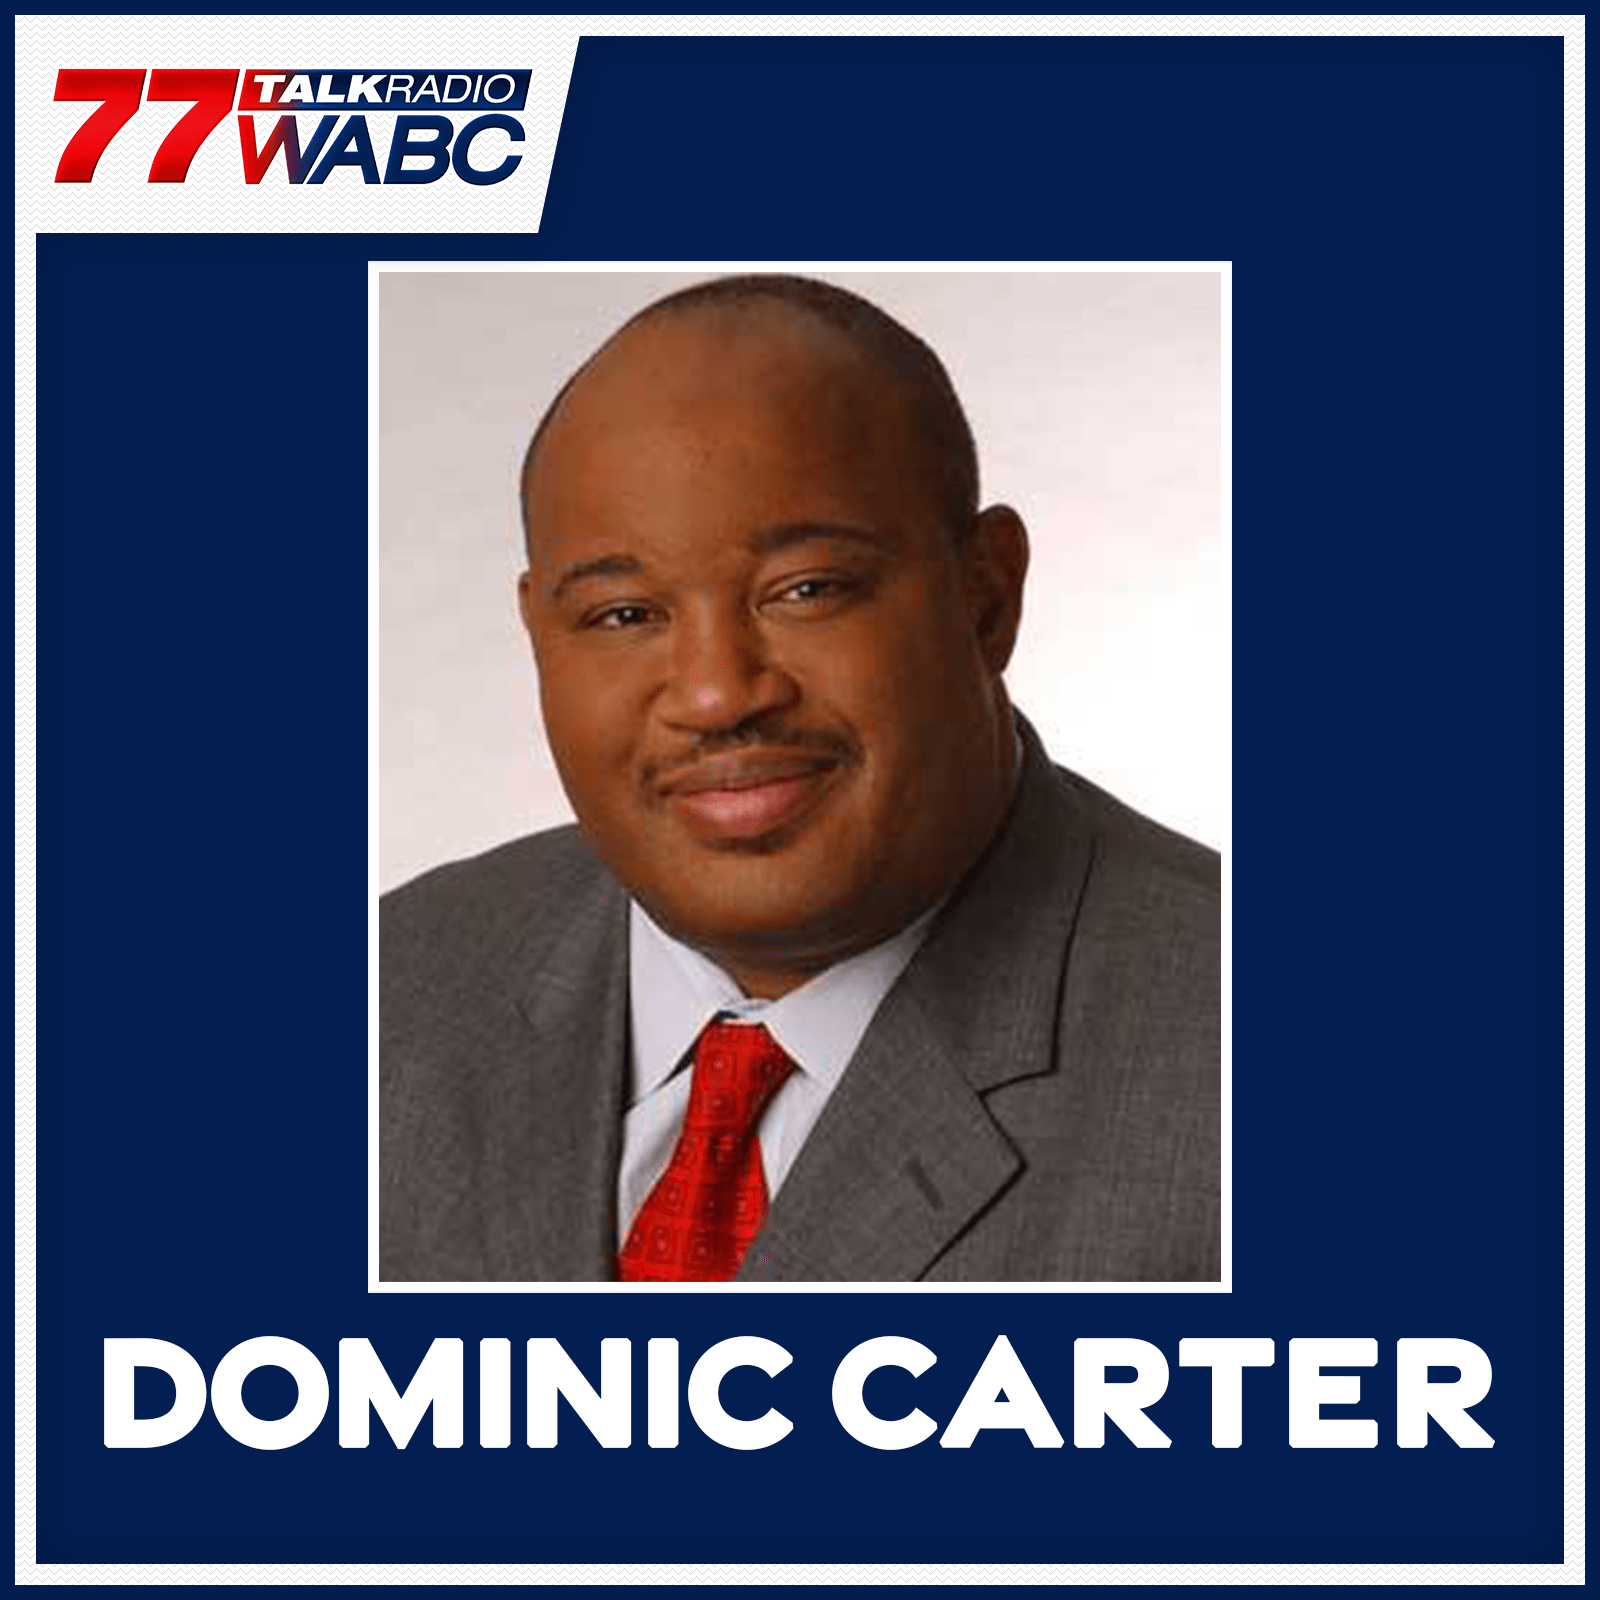 Dominic Carter